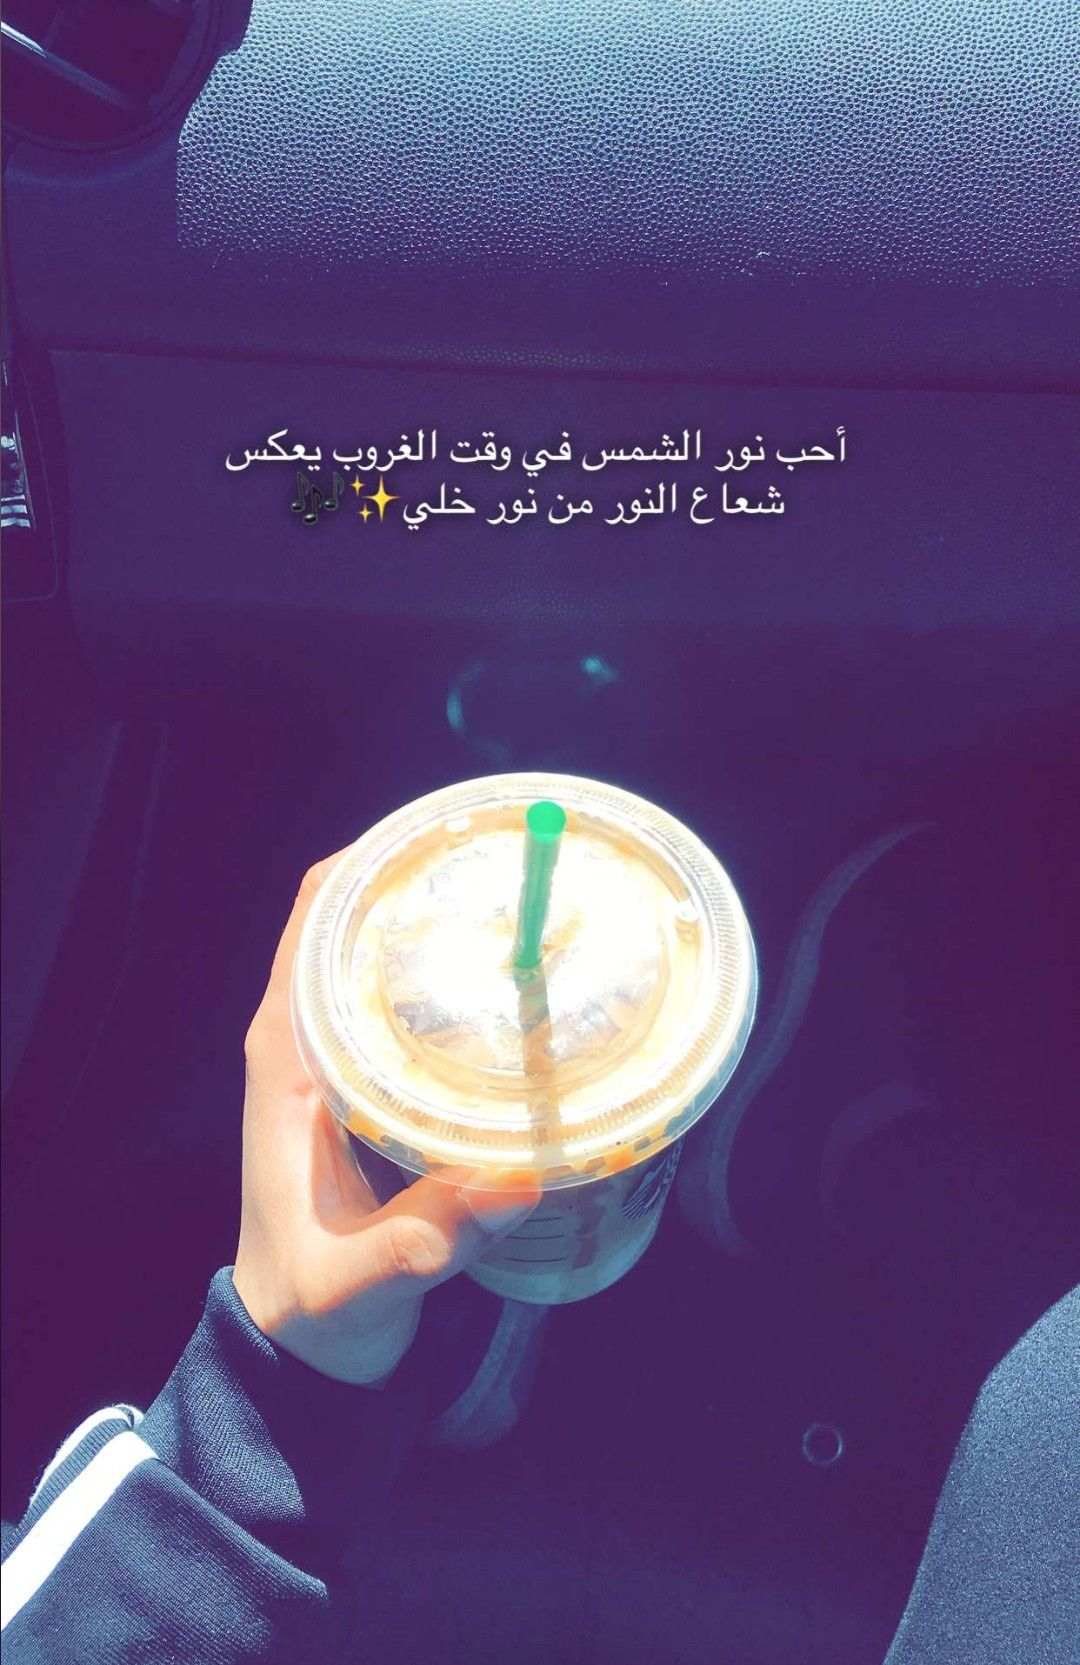 Pin By إشراق الحربي On جمال الكلام والعبارات Cover Photo Quotes Photo Quotes Snapchat Quotes